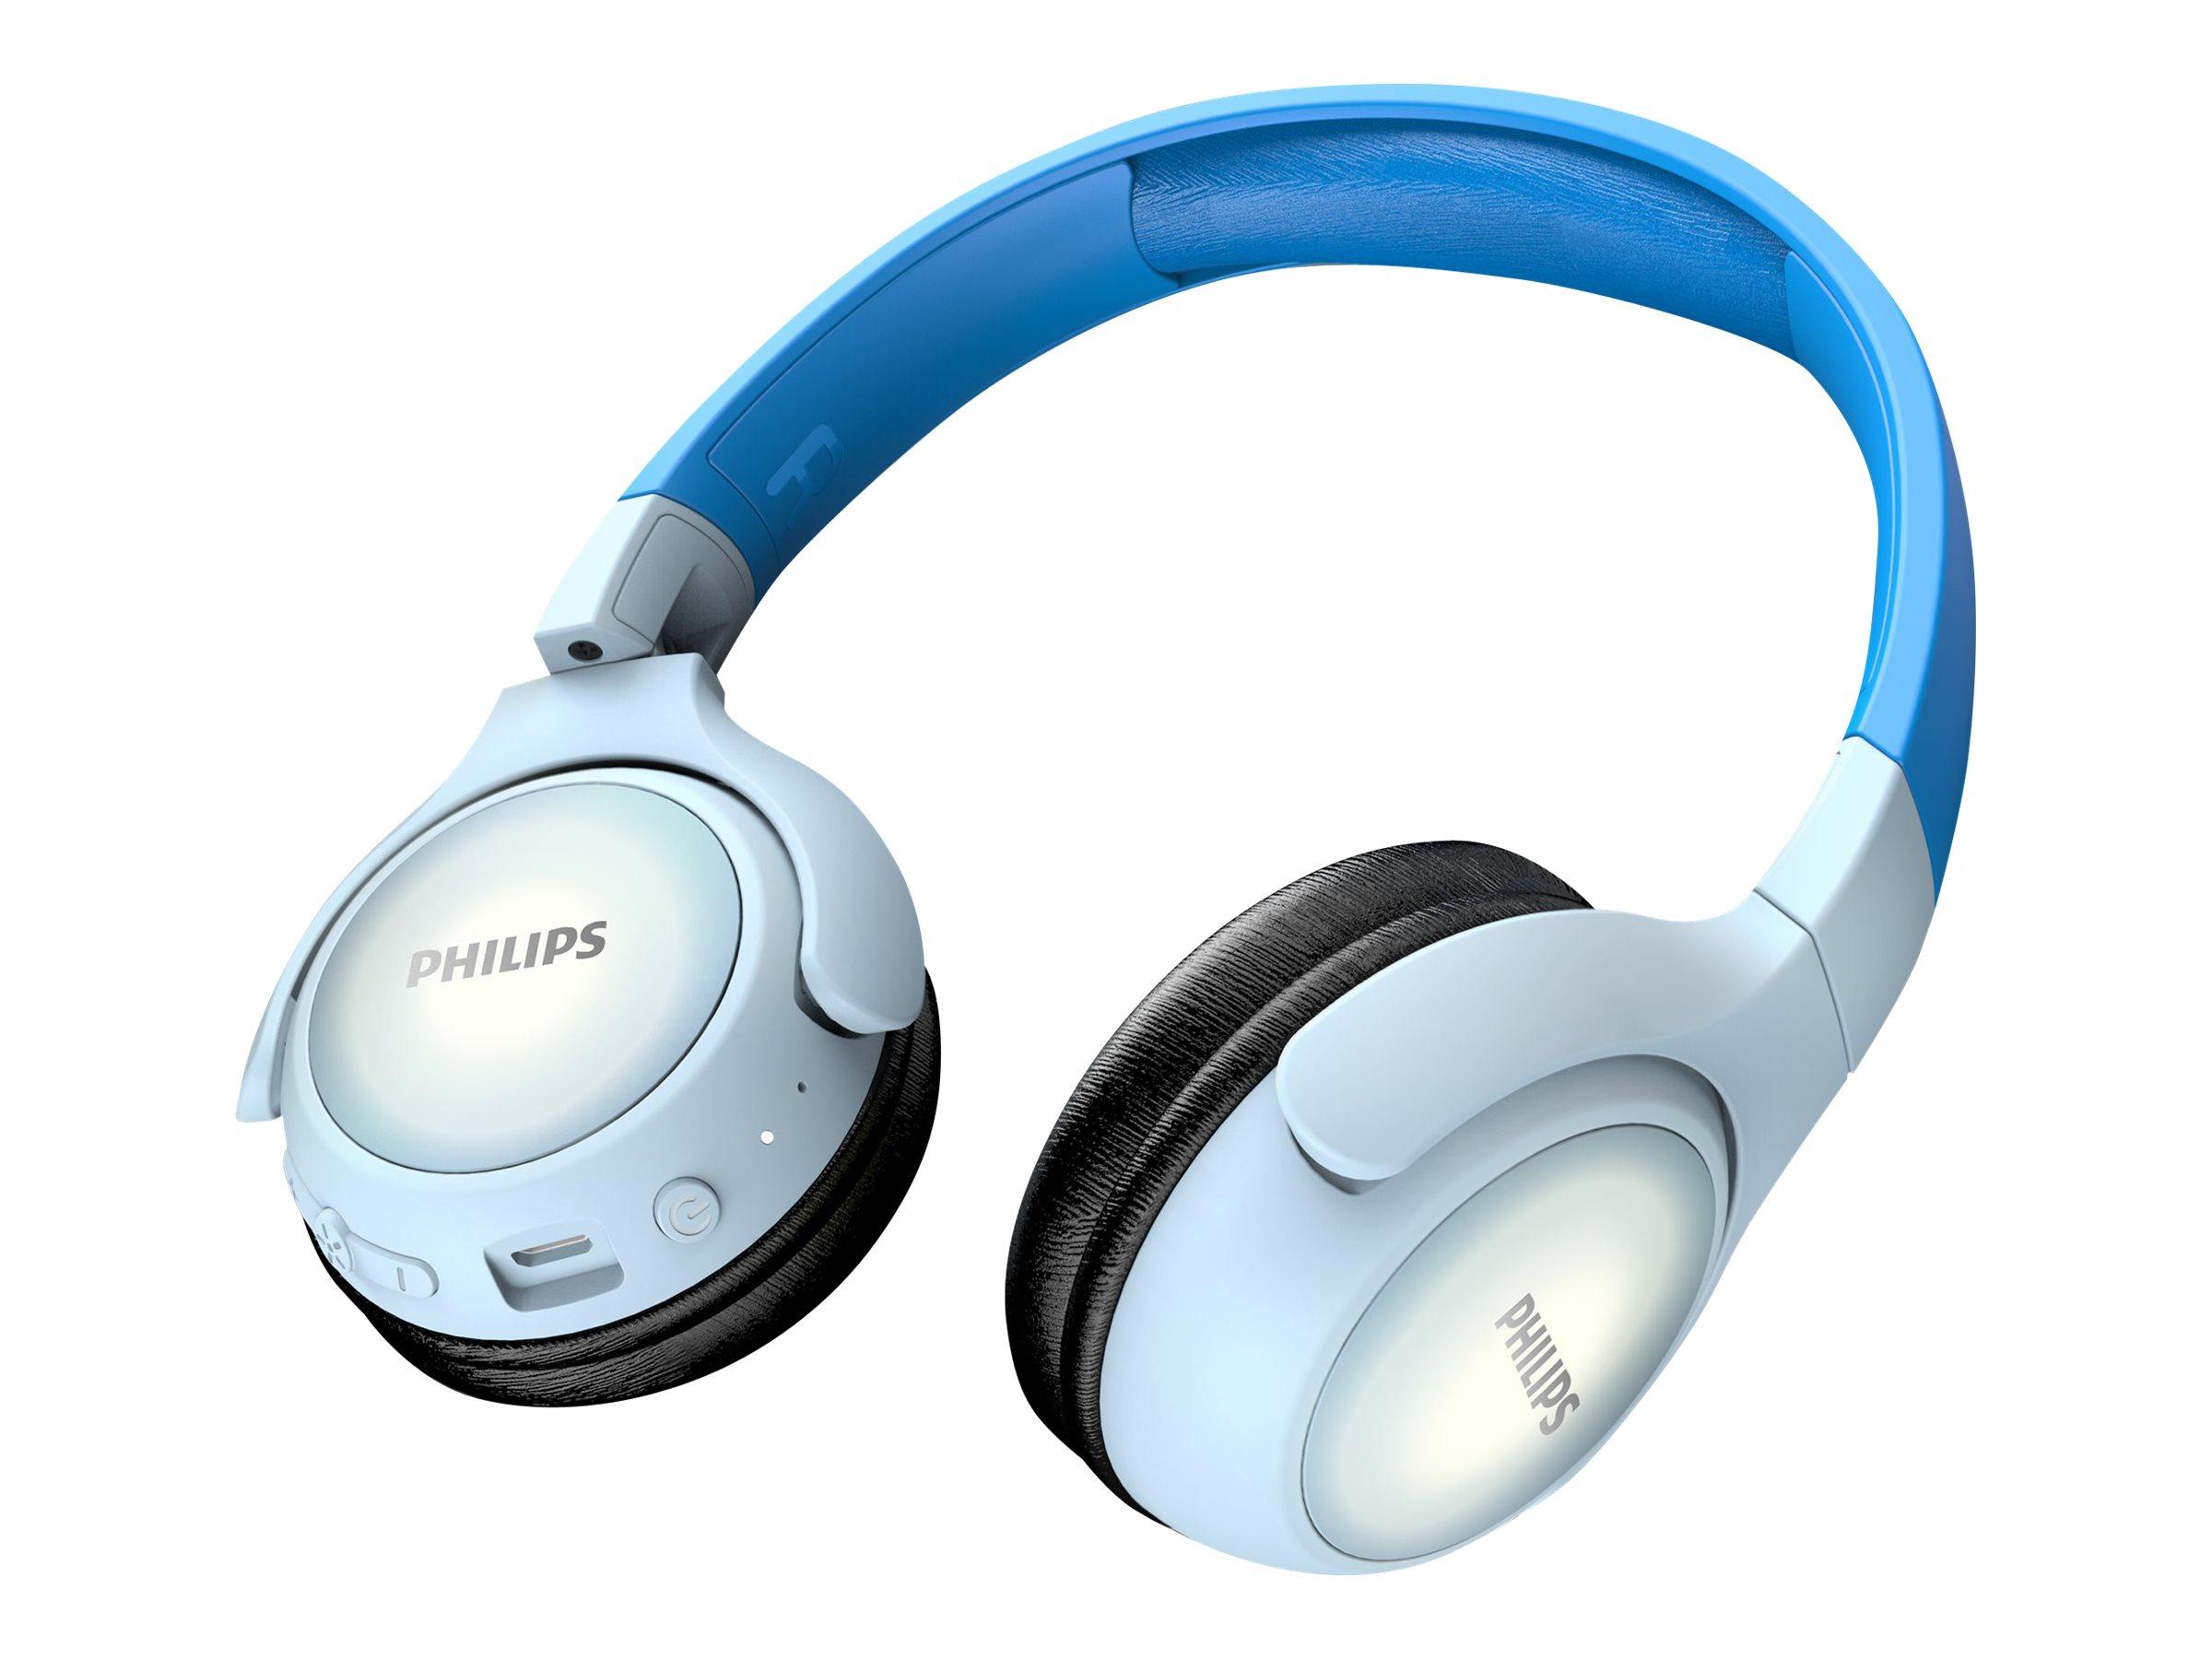 Philips TAKH402BL - Kopfhörer mit Mikrofon - On-Ear - Bluetooth - kabellos - Blau